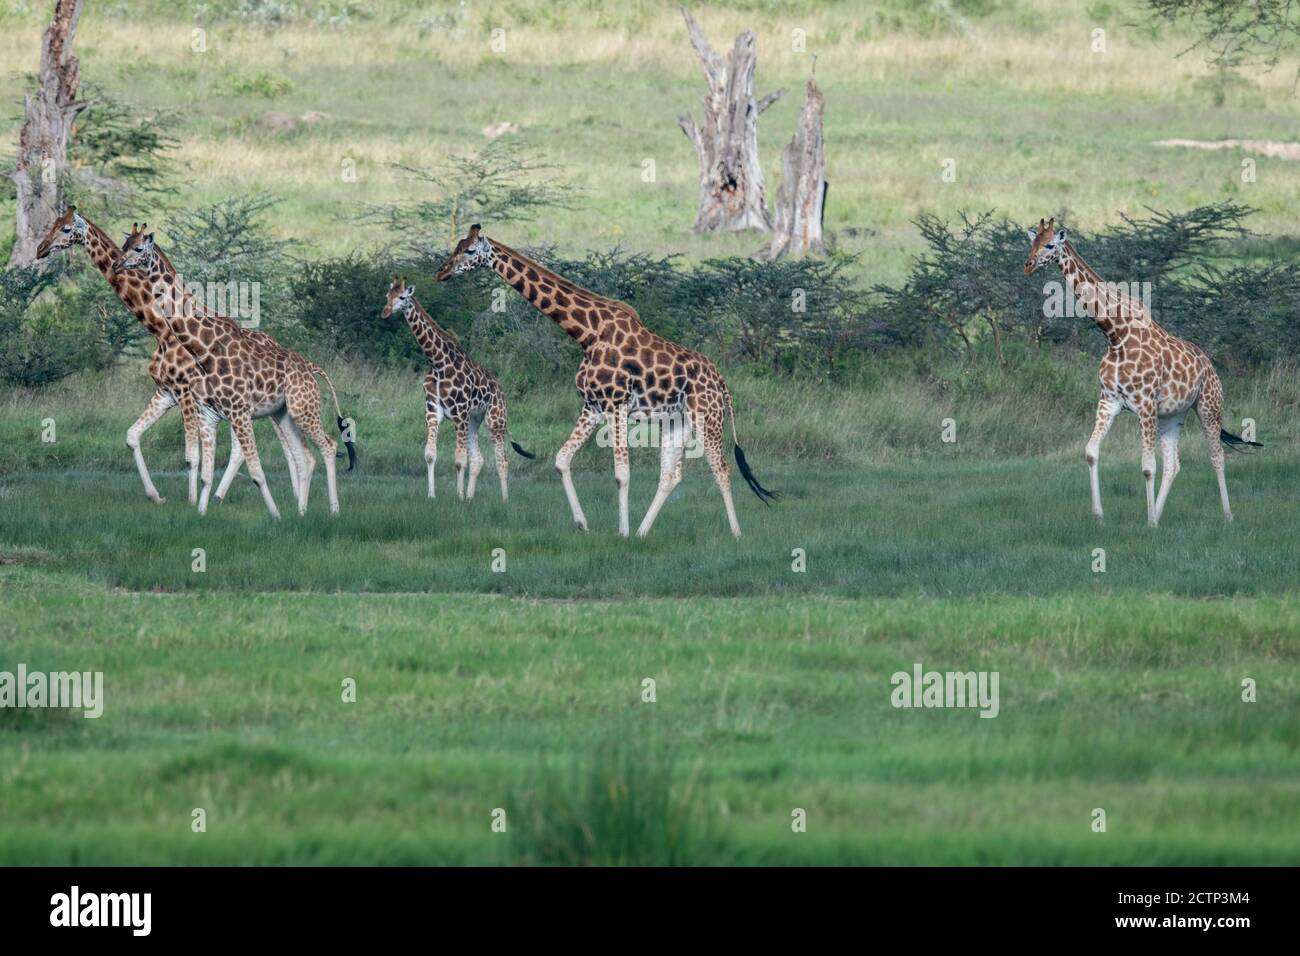 Netzgiraffen (Giraffa camelopardalis reticulata) Stockfoto